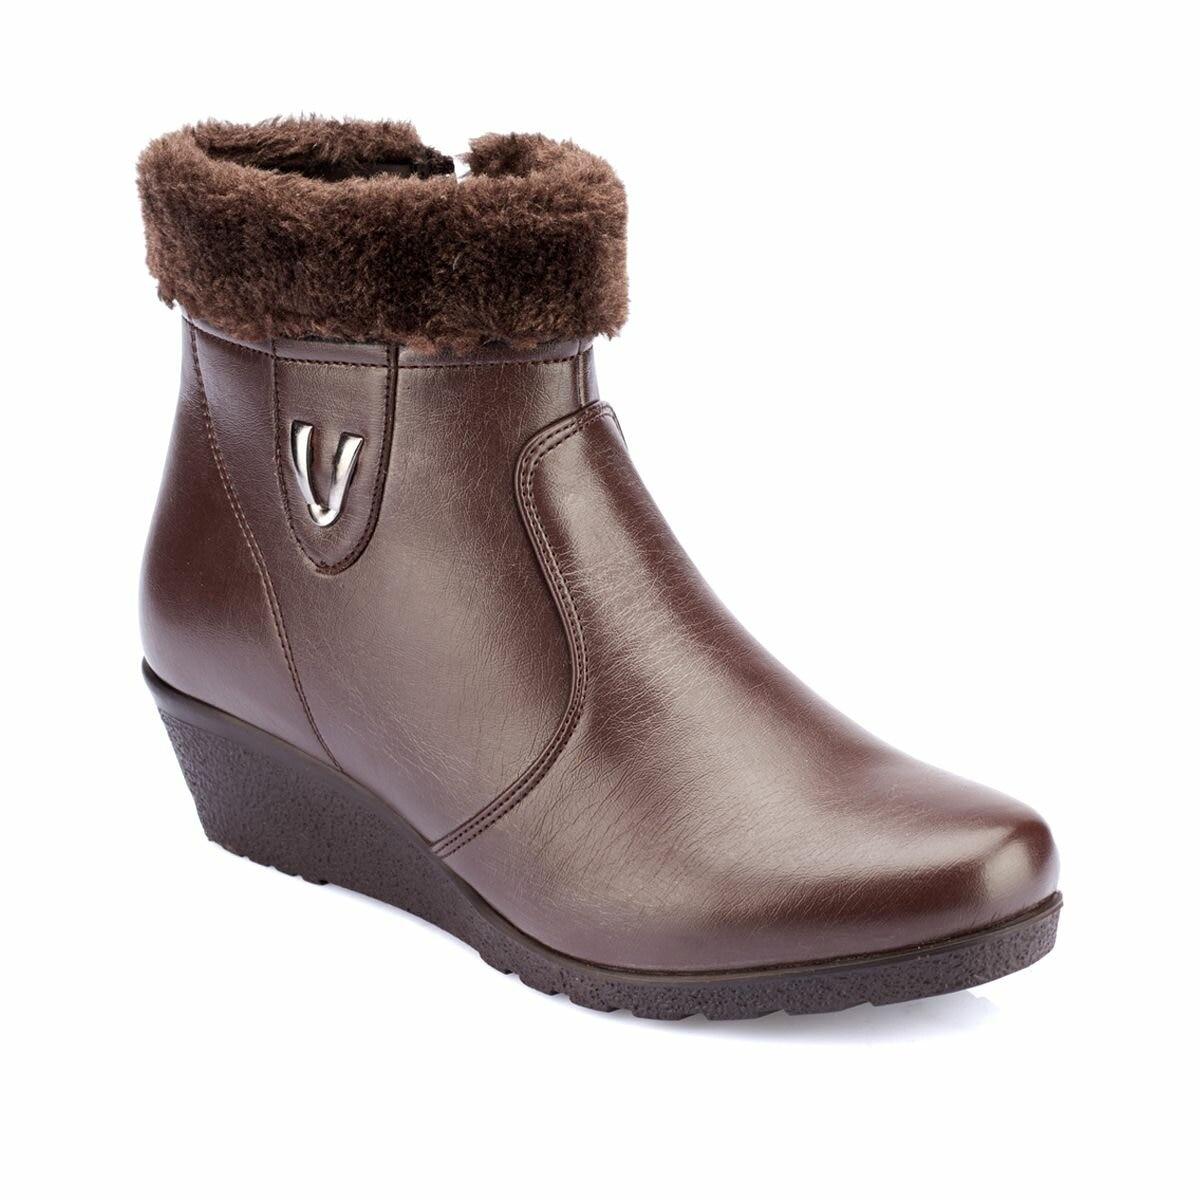 FLO 82.150367.Z Brown Women 'S Boots Polaris